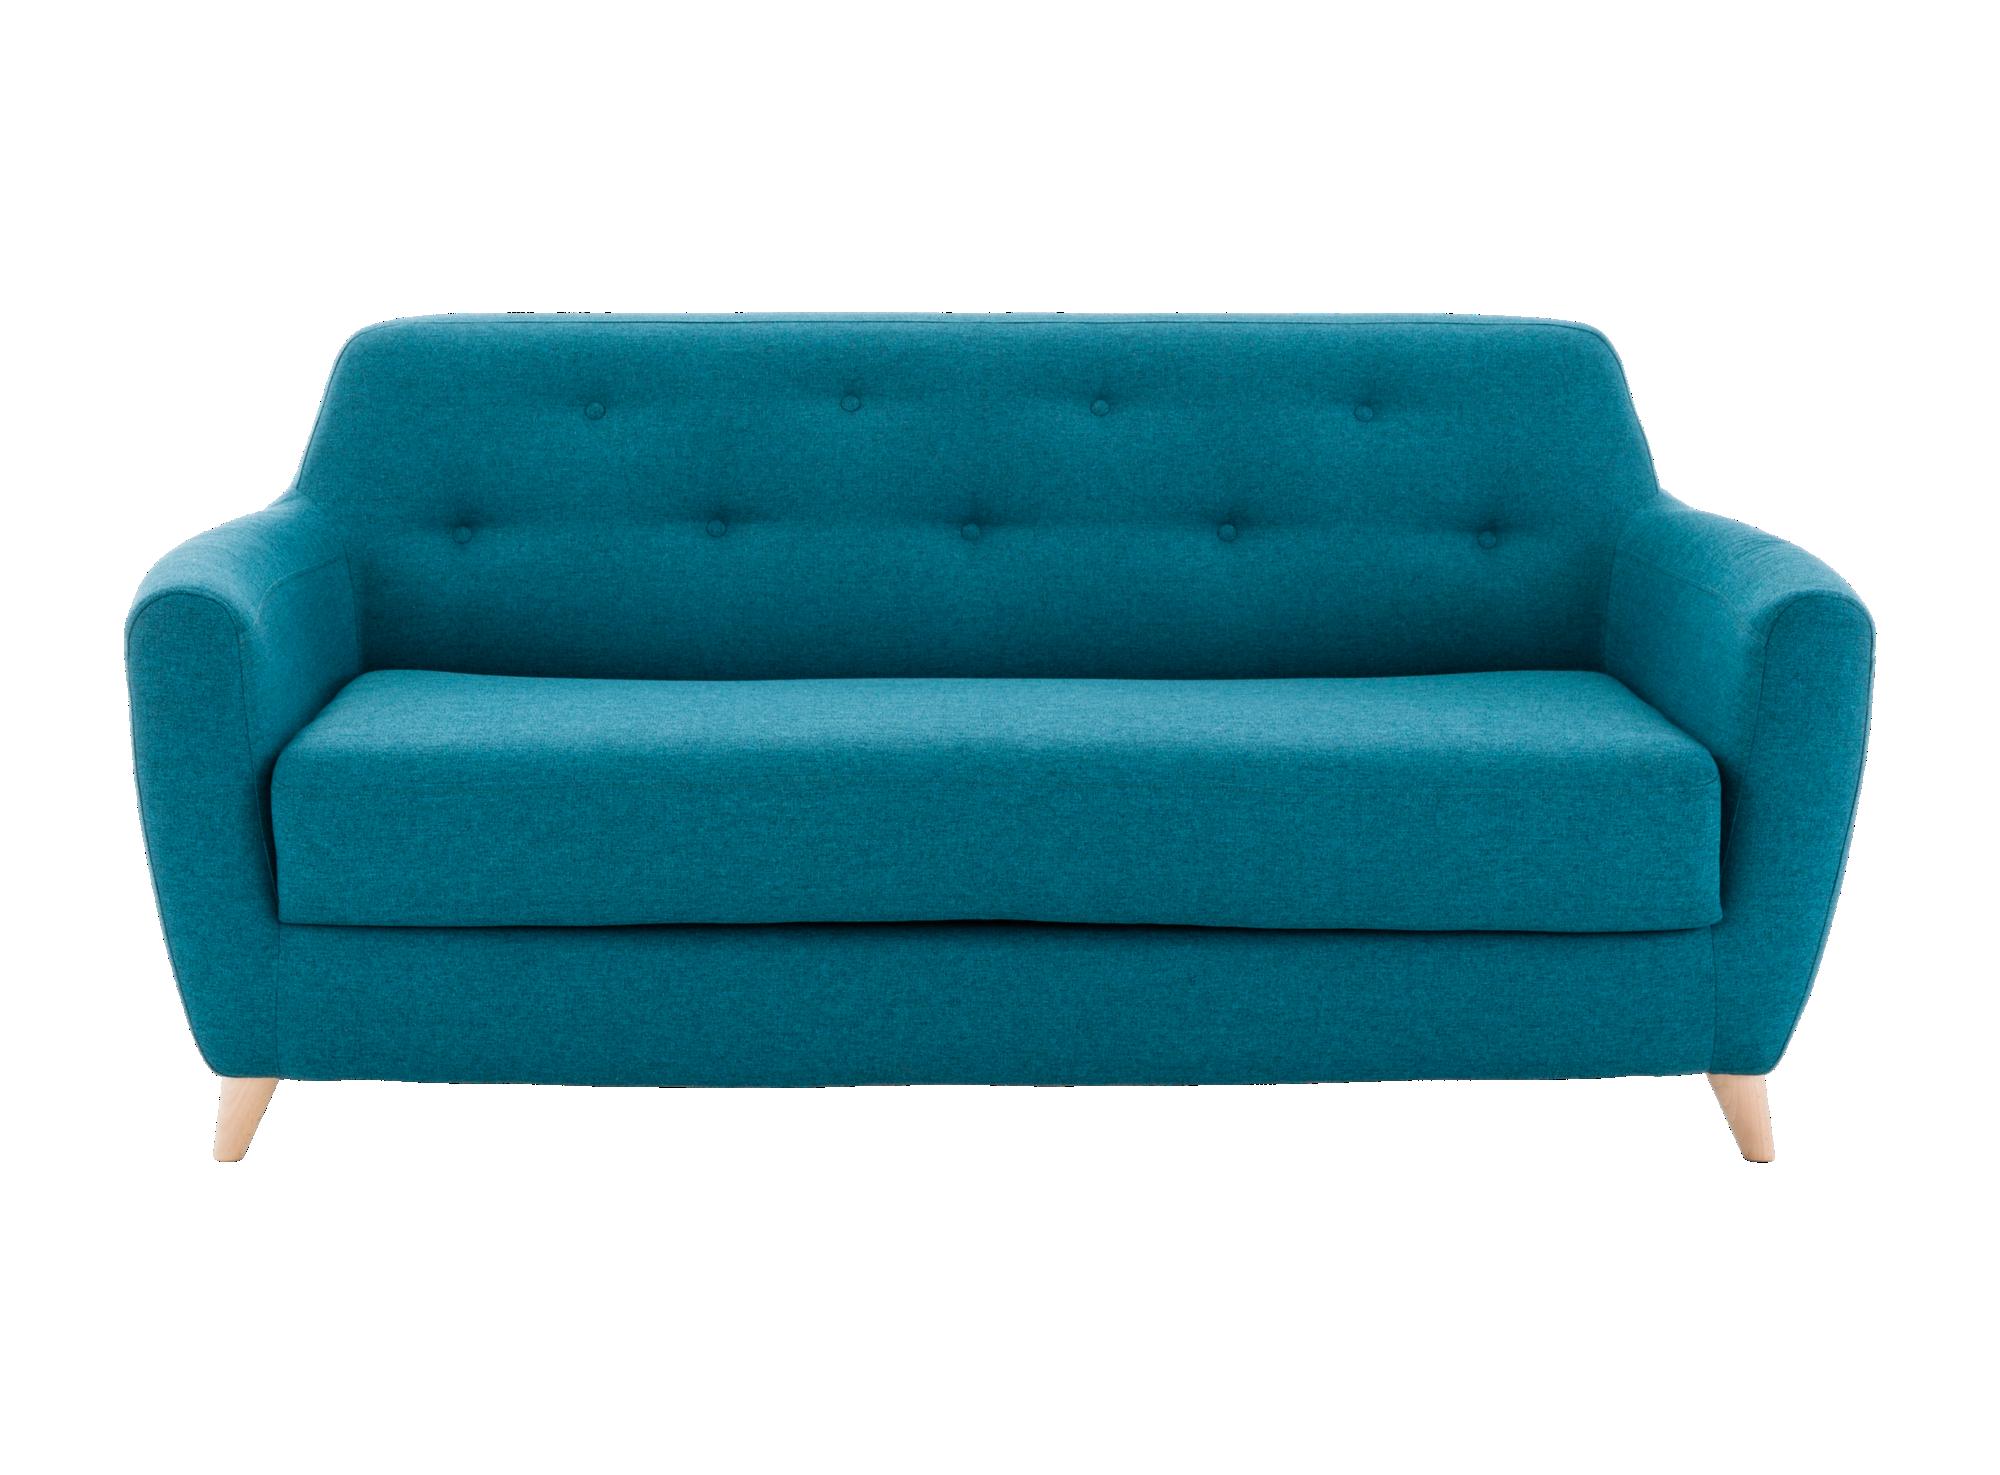 Bien connu Canape convertible 3 places tissu bleu | Fly | bureau | Pinterest  OK85